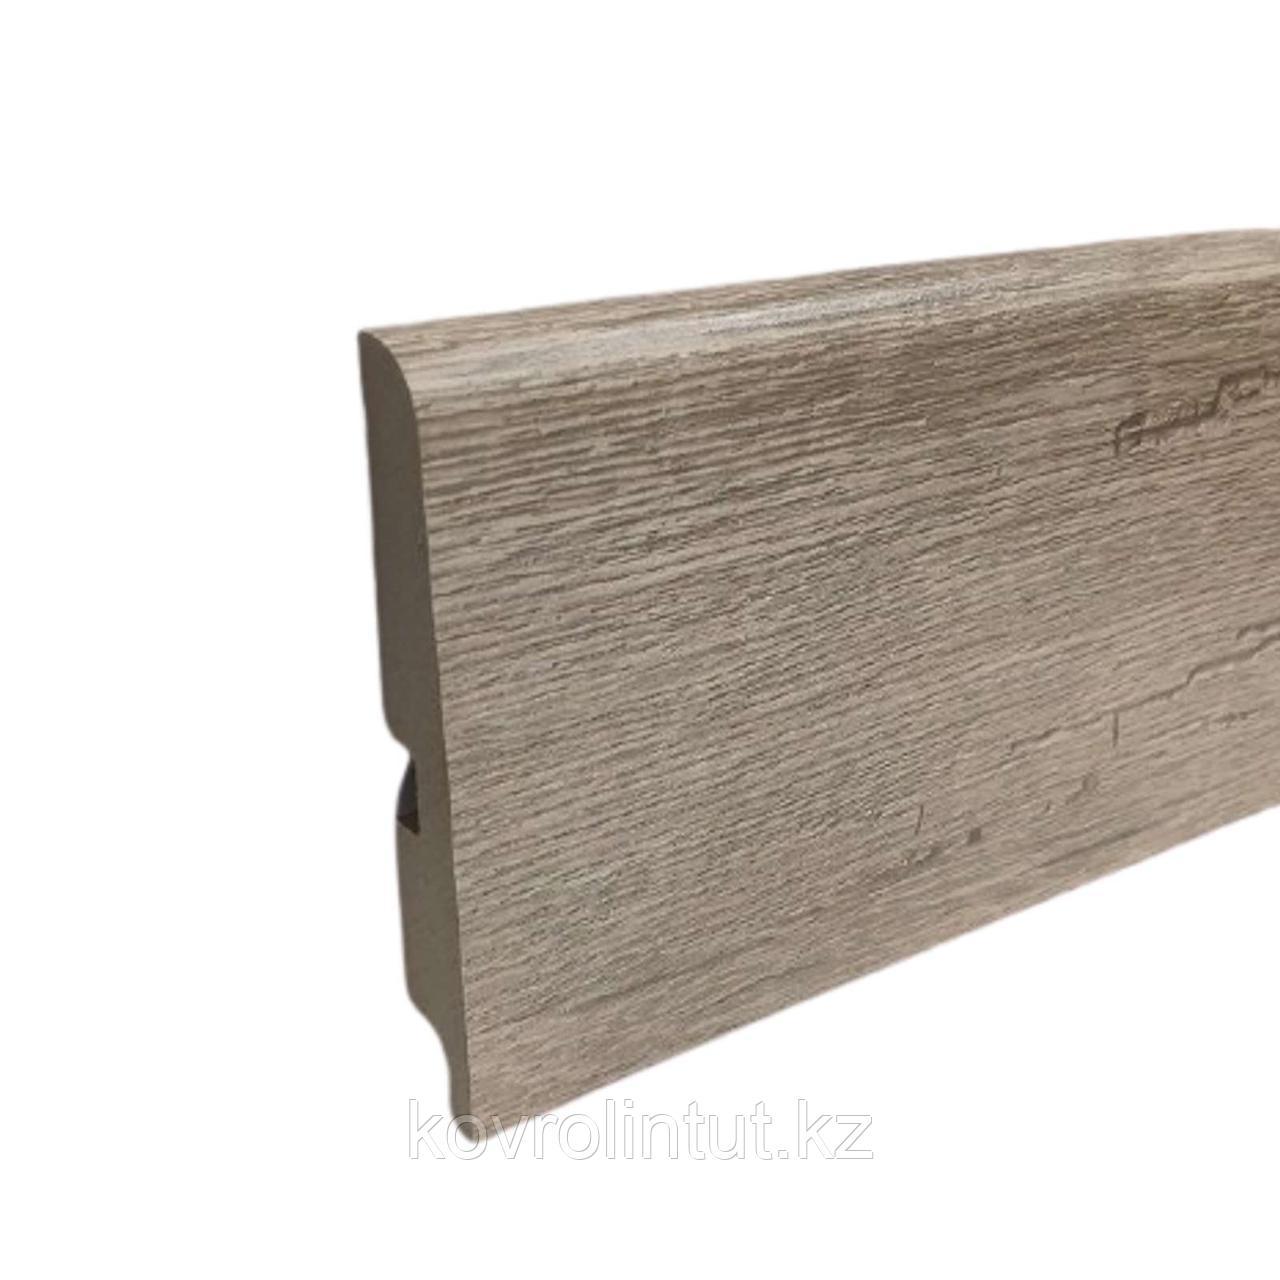 Плинтус Kronopol P85 3325\VB1203 Verona Oak, 2500х85х16мм, 9шт/уп